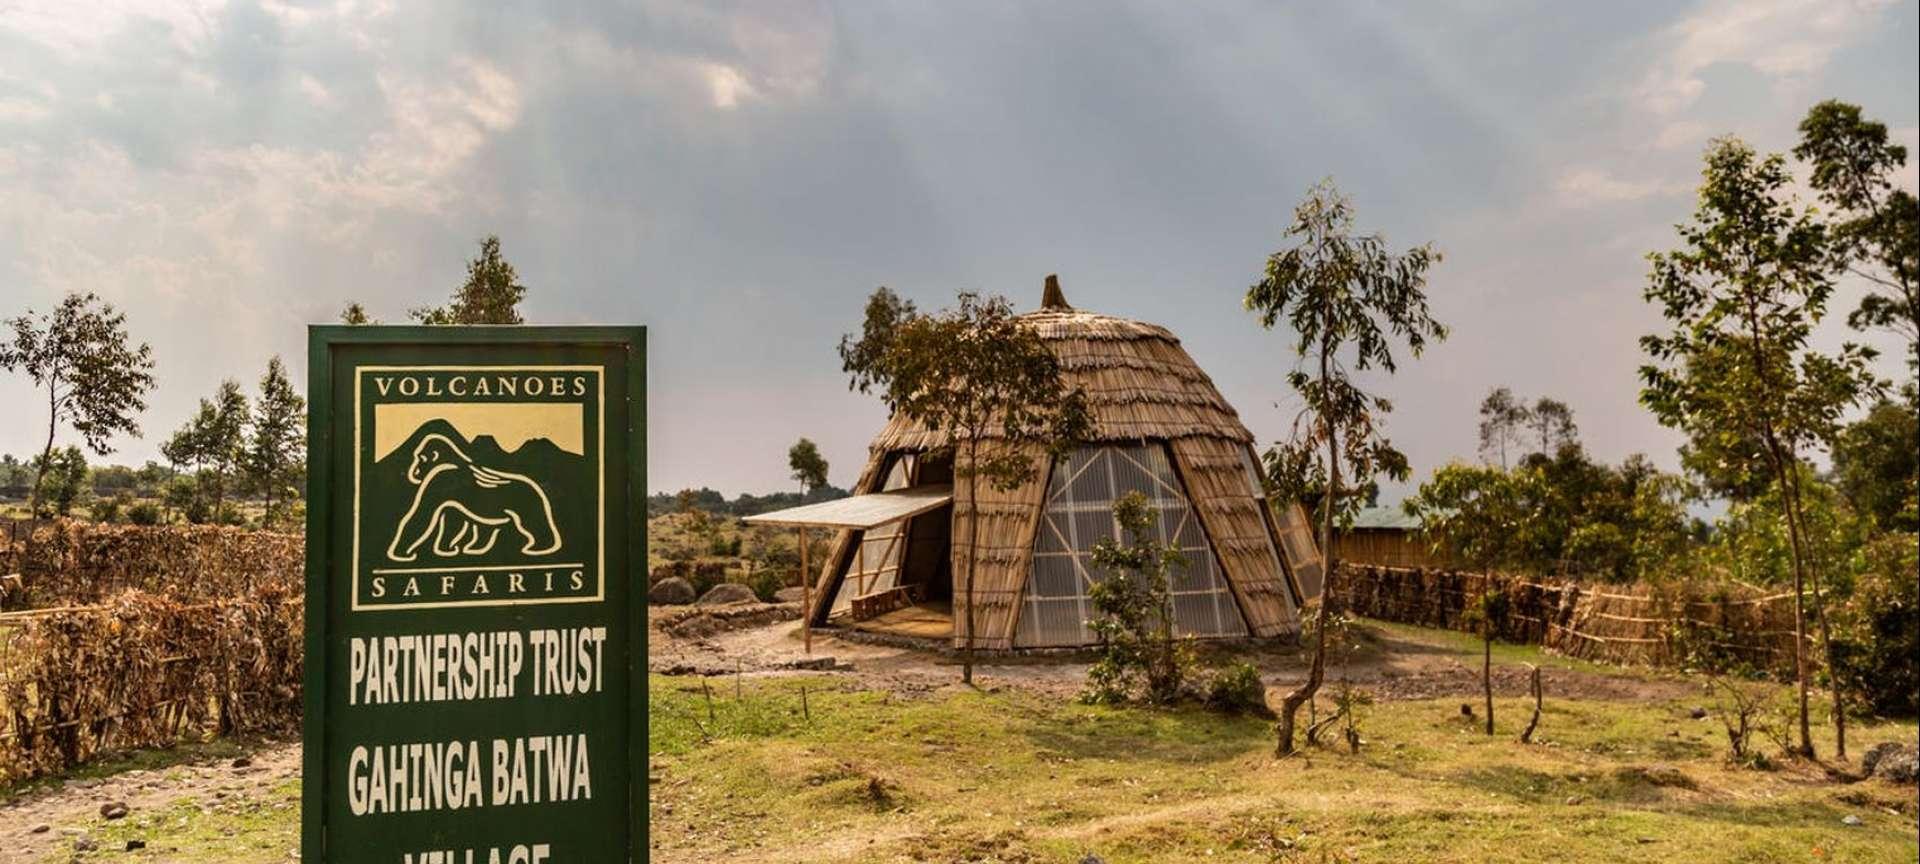 Mgahinga Gorilla National Park - Africa Wildlife Safaris